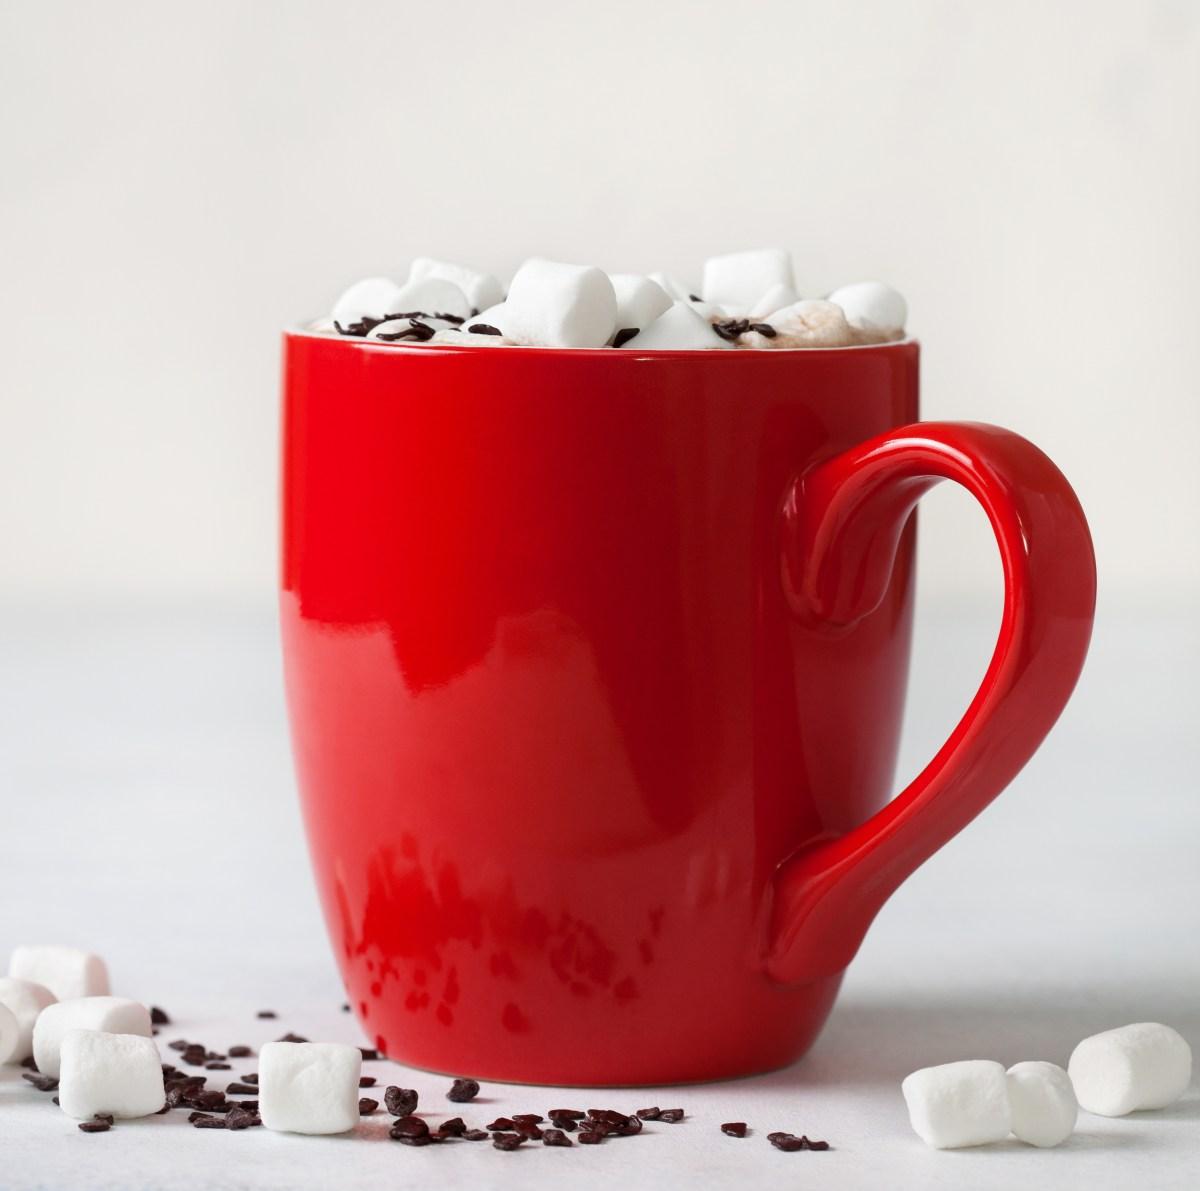 Christmas morning hot cocoa recipe close up